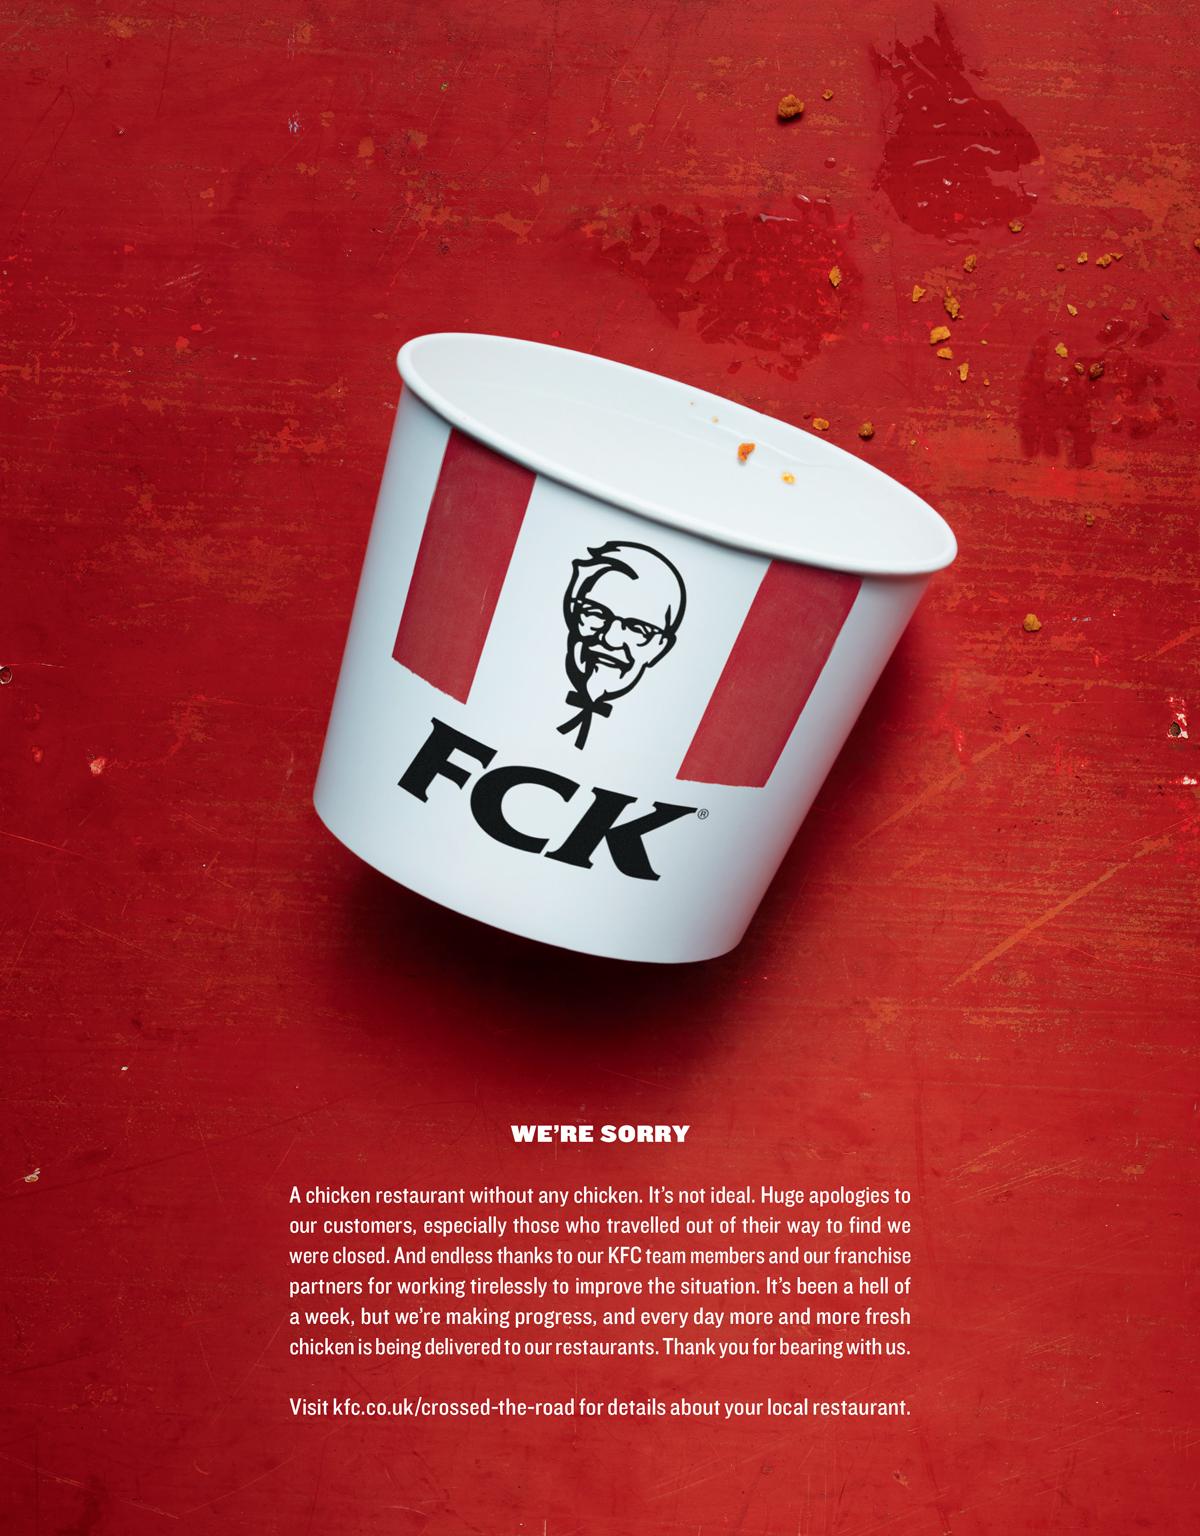 KFC rolls the dice and strikes crisis-response gold